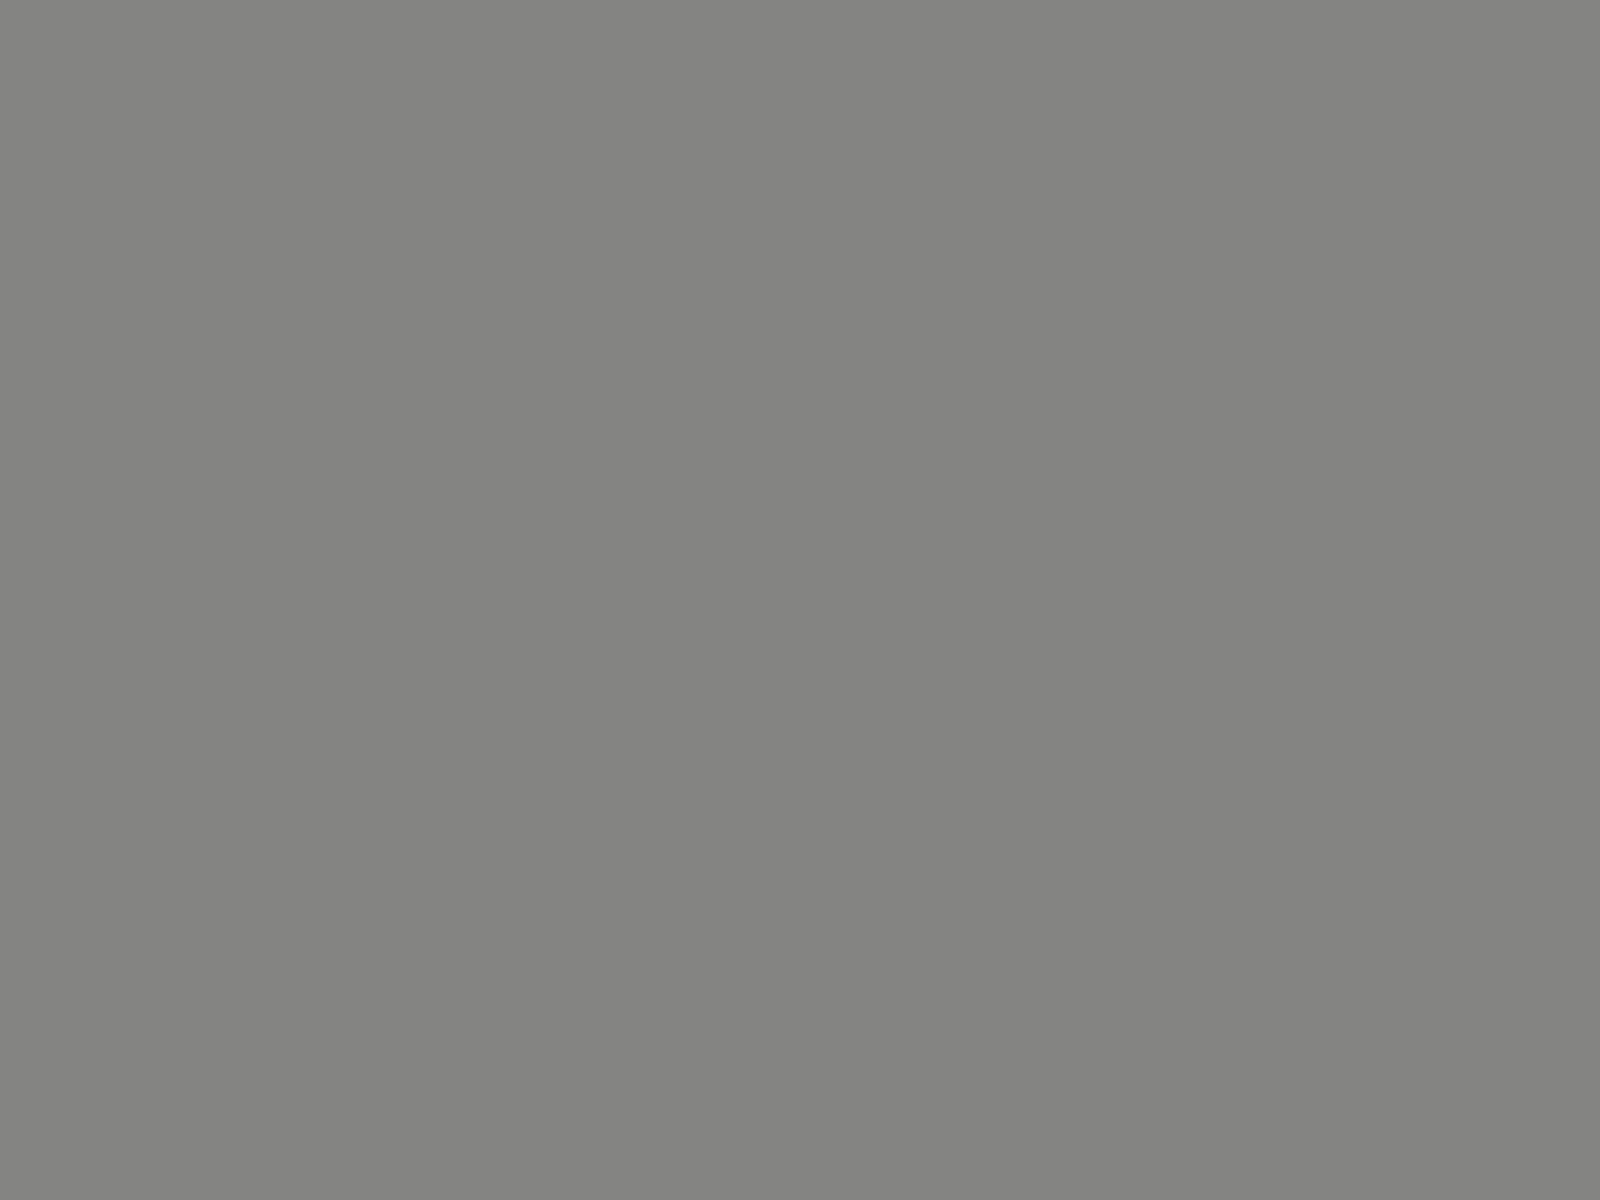 1600x1200 Battleship Grey Solid Color Background